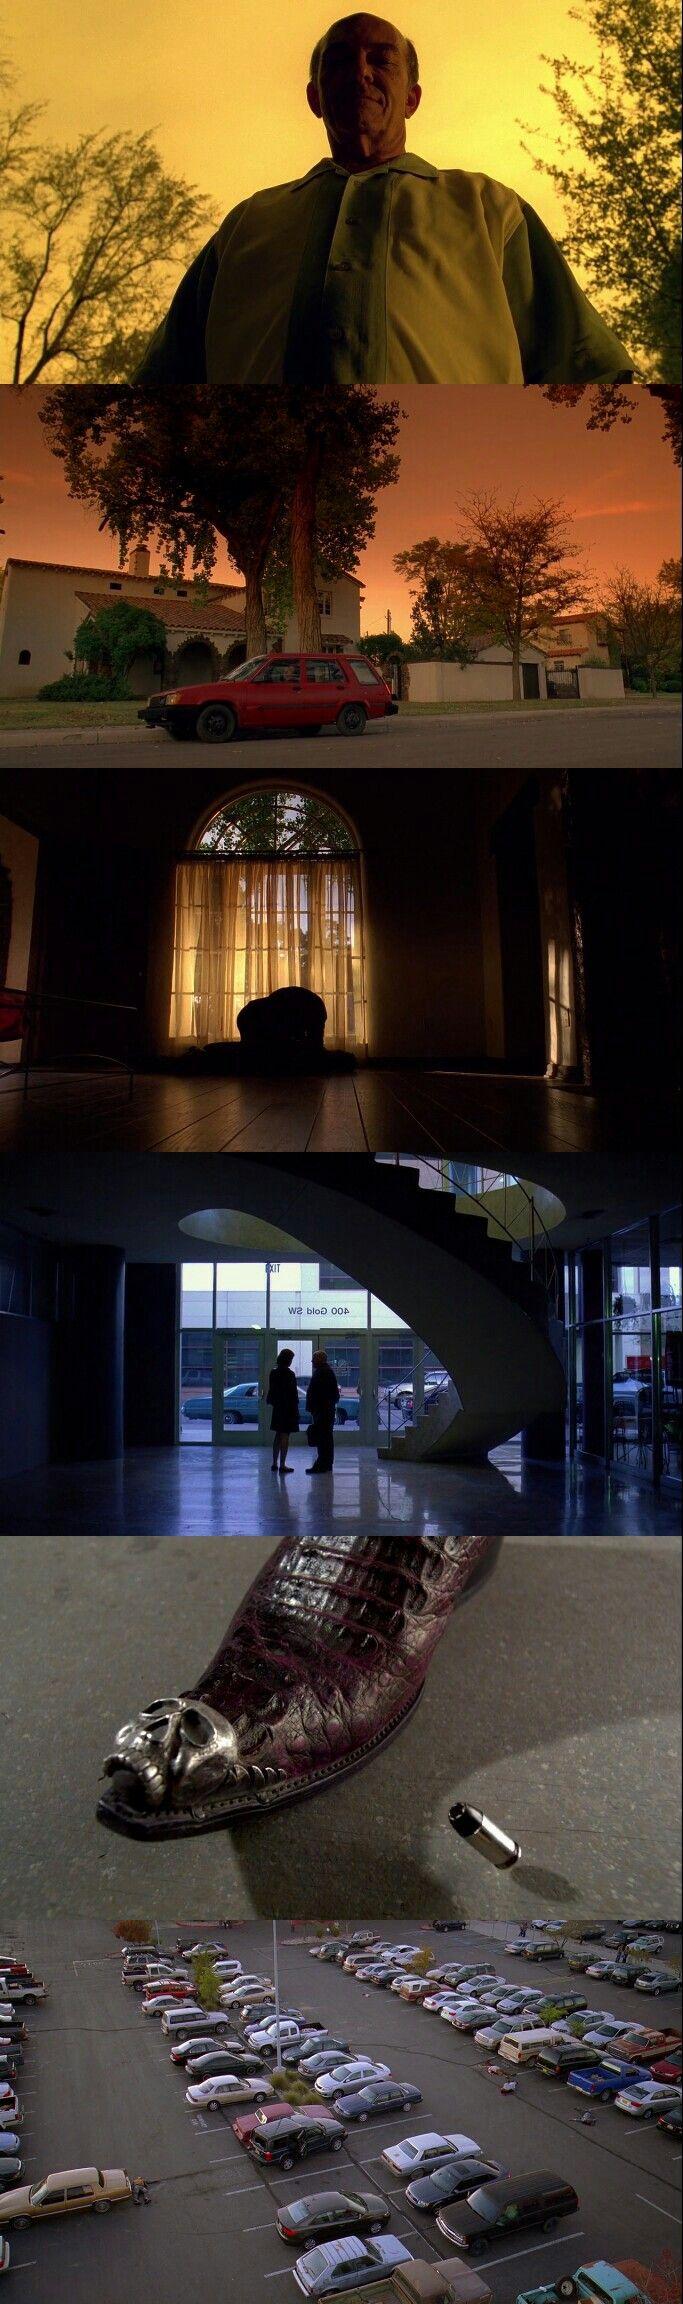 Breaking Bad(2008 - 2013) Season 3 Episode 7 : One Minute.